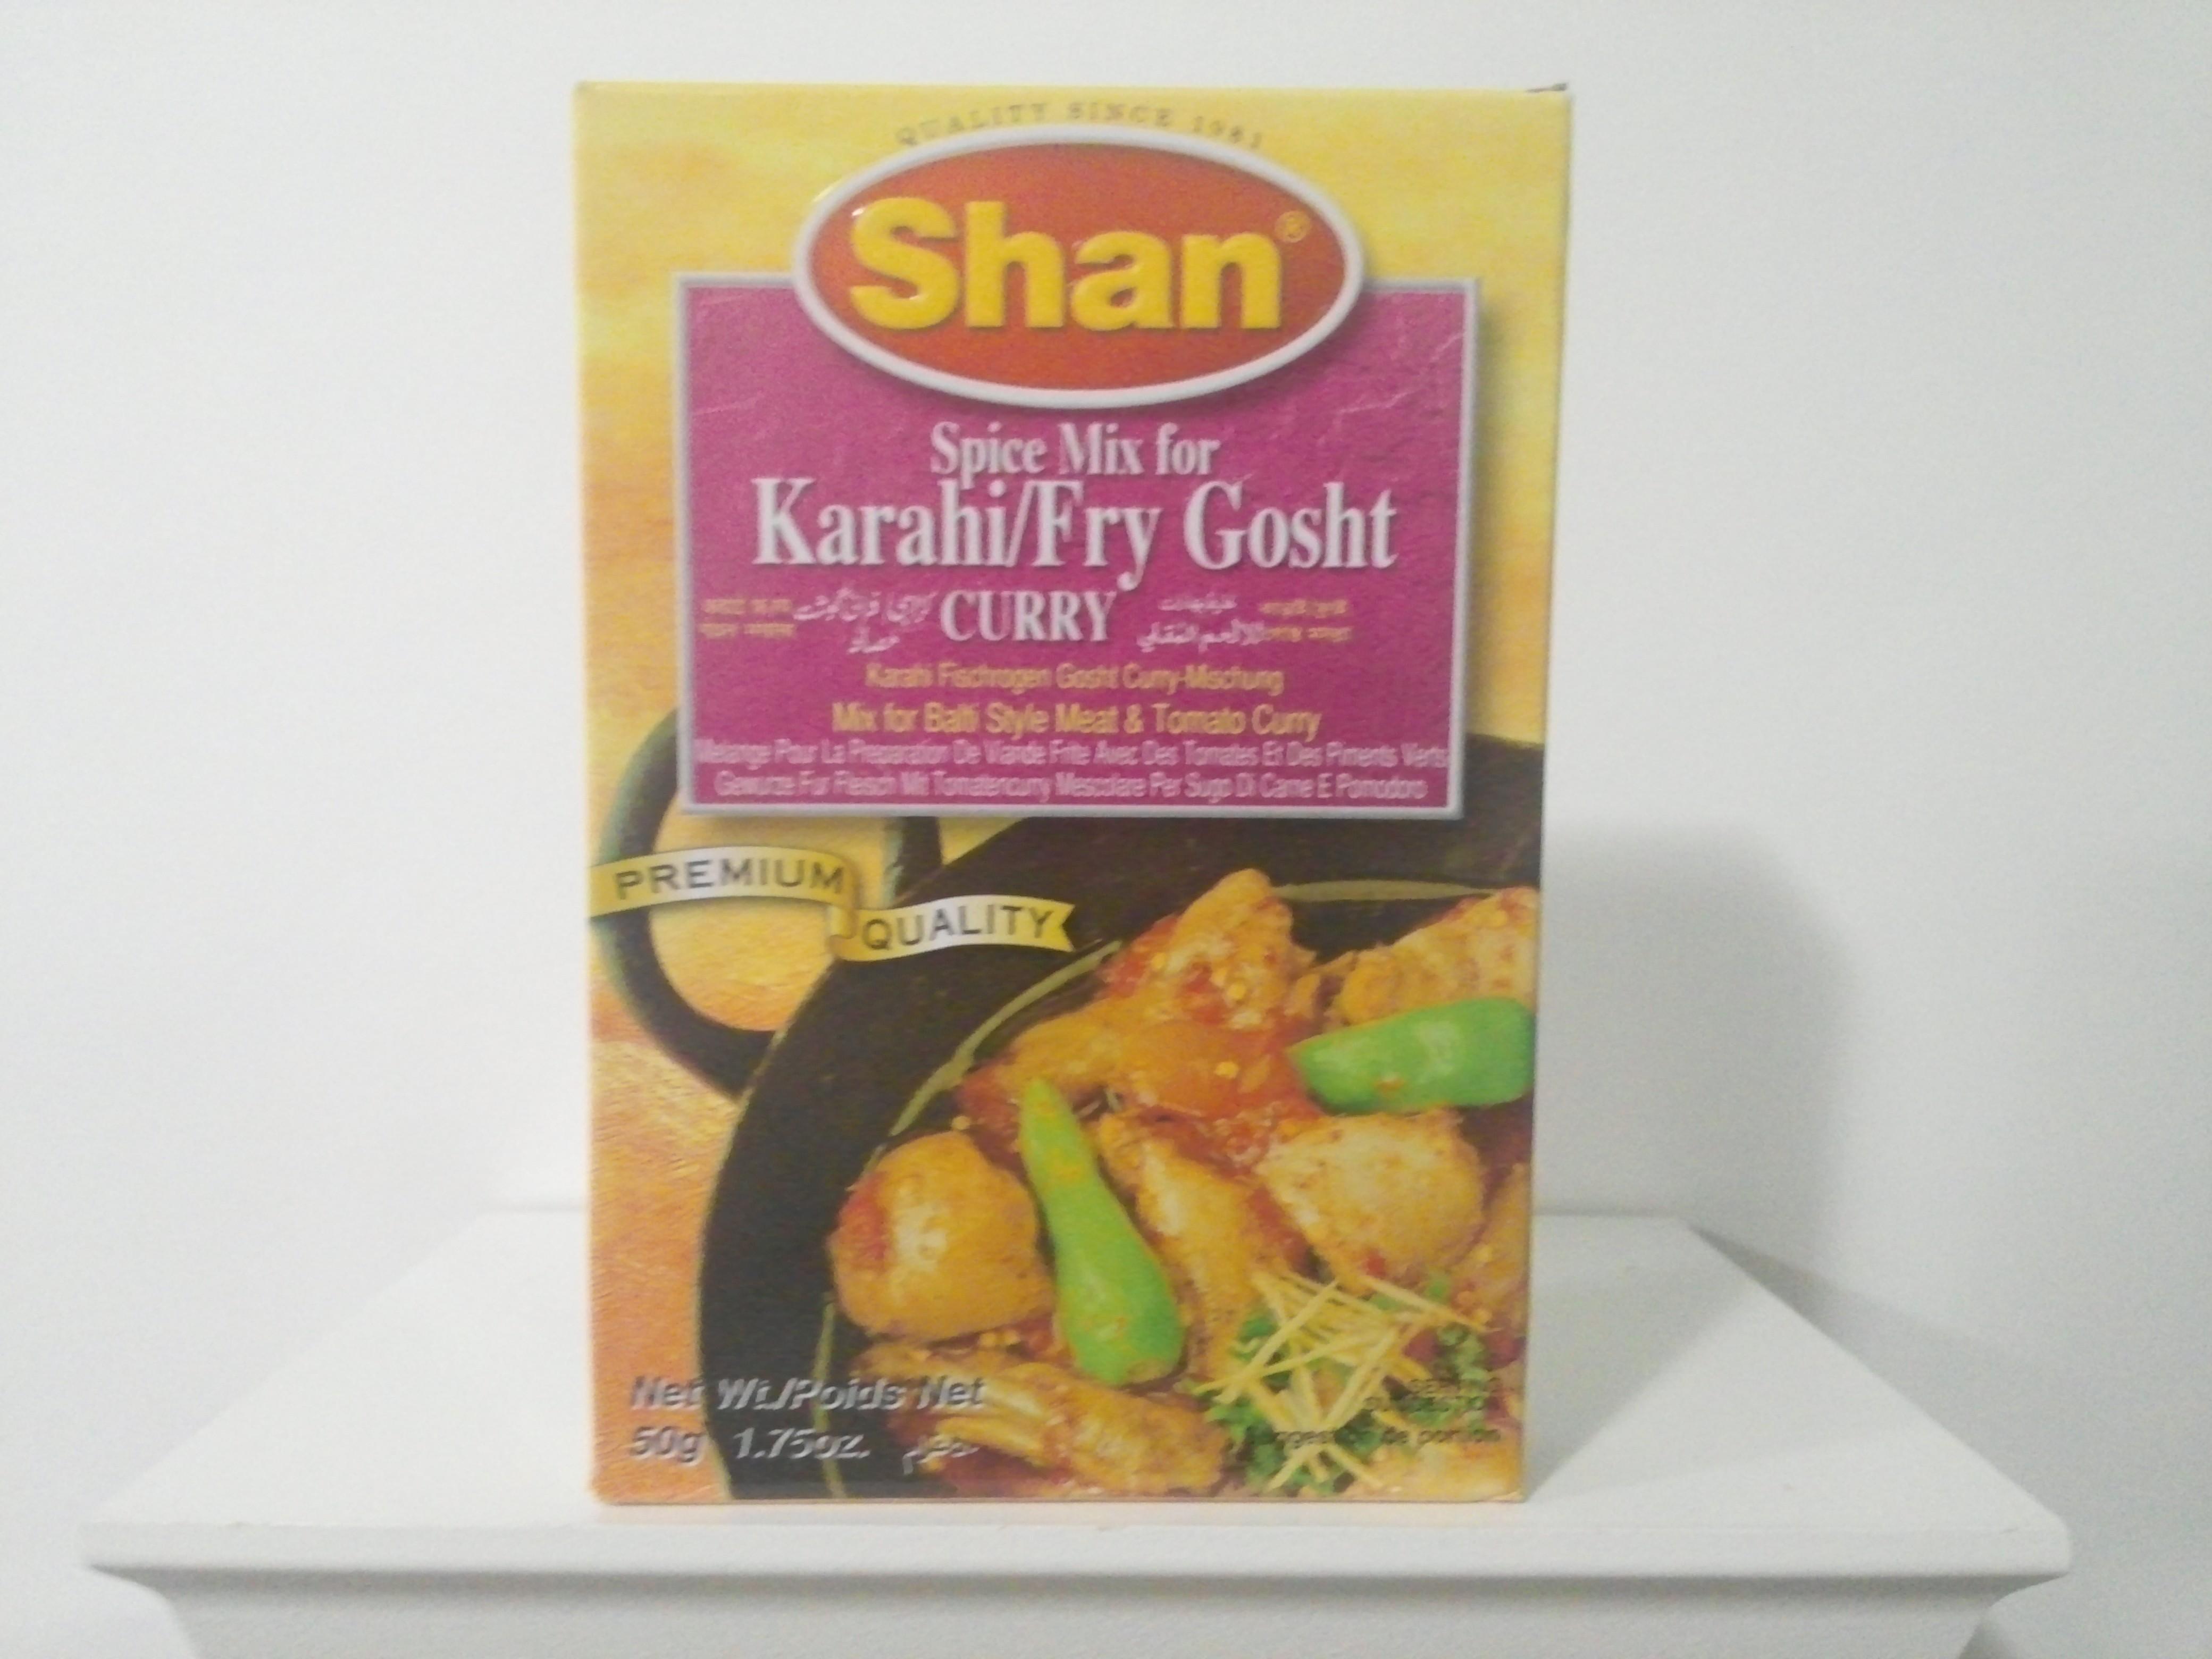 Shan Karahi/Fry Gosht Spice Mix 50 grm